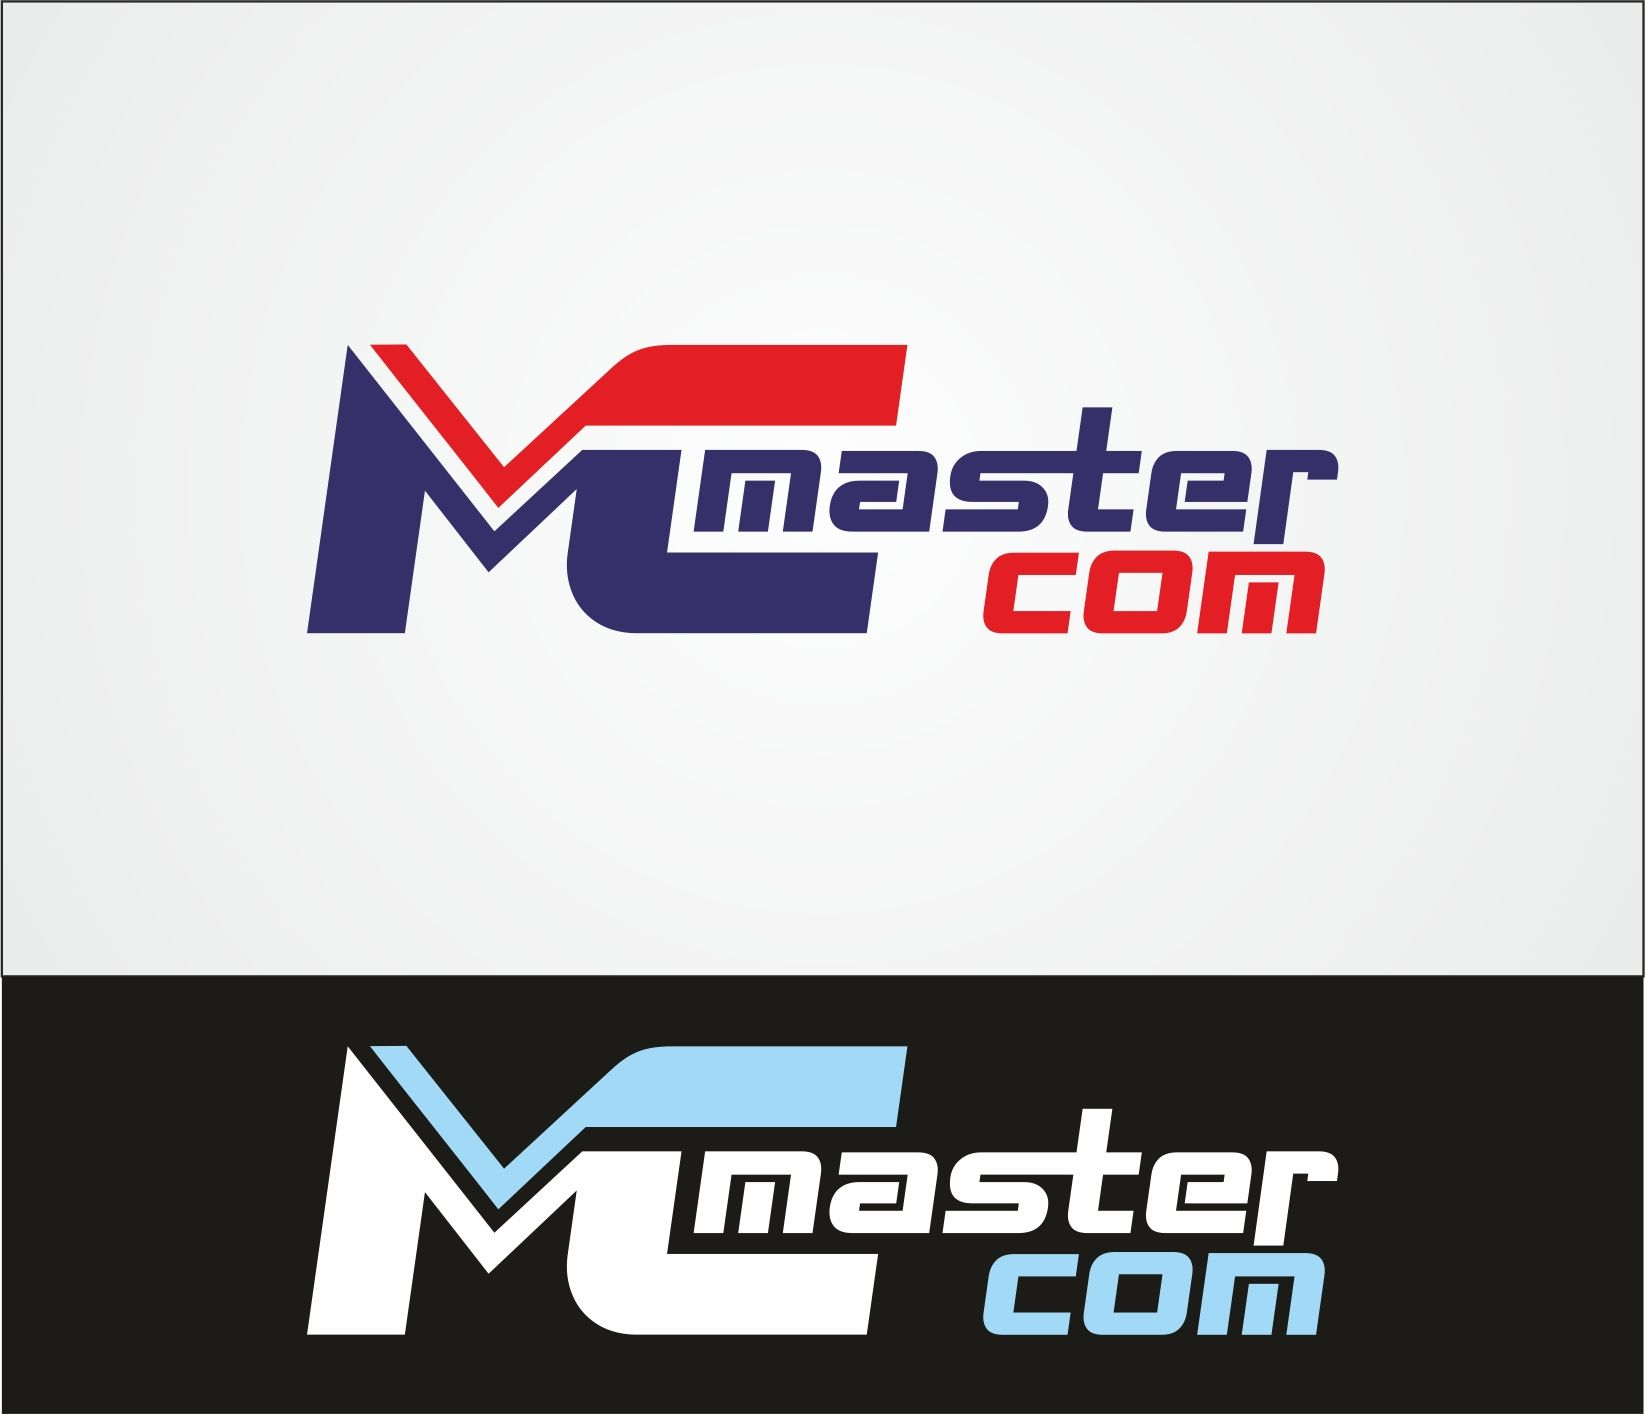 MasterCom (логотип, фирменный стиль) - дизайнер graphin4ik